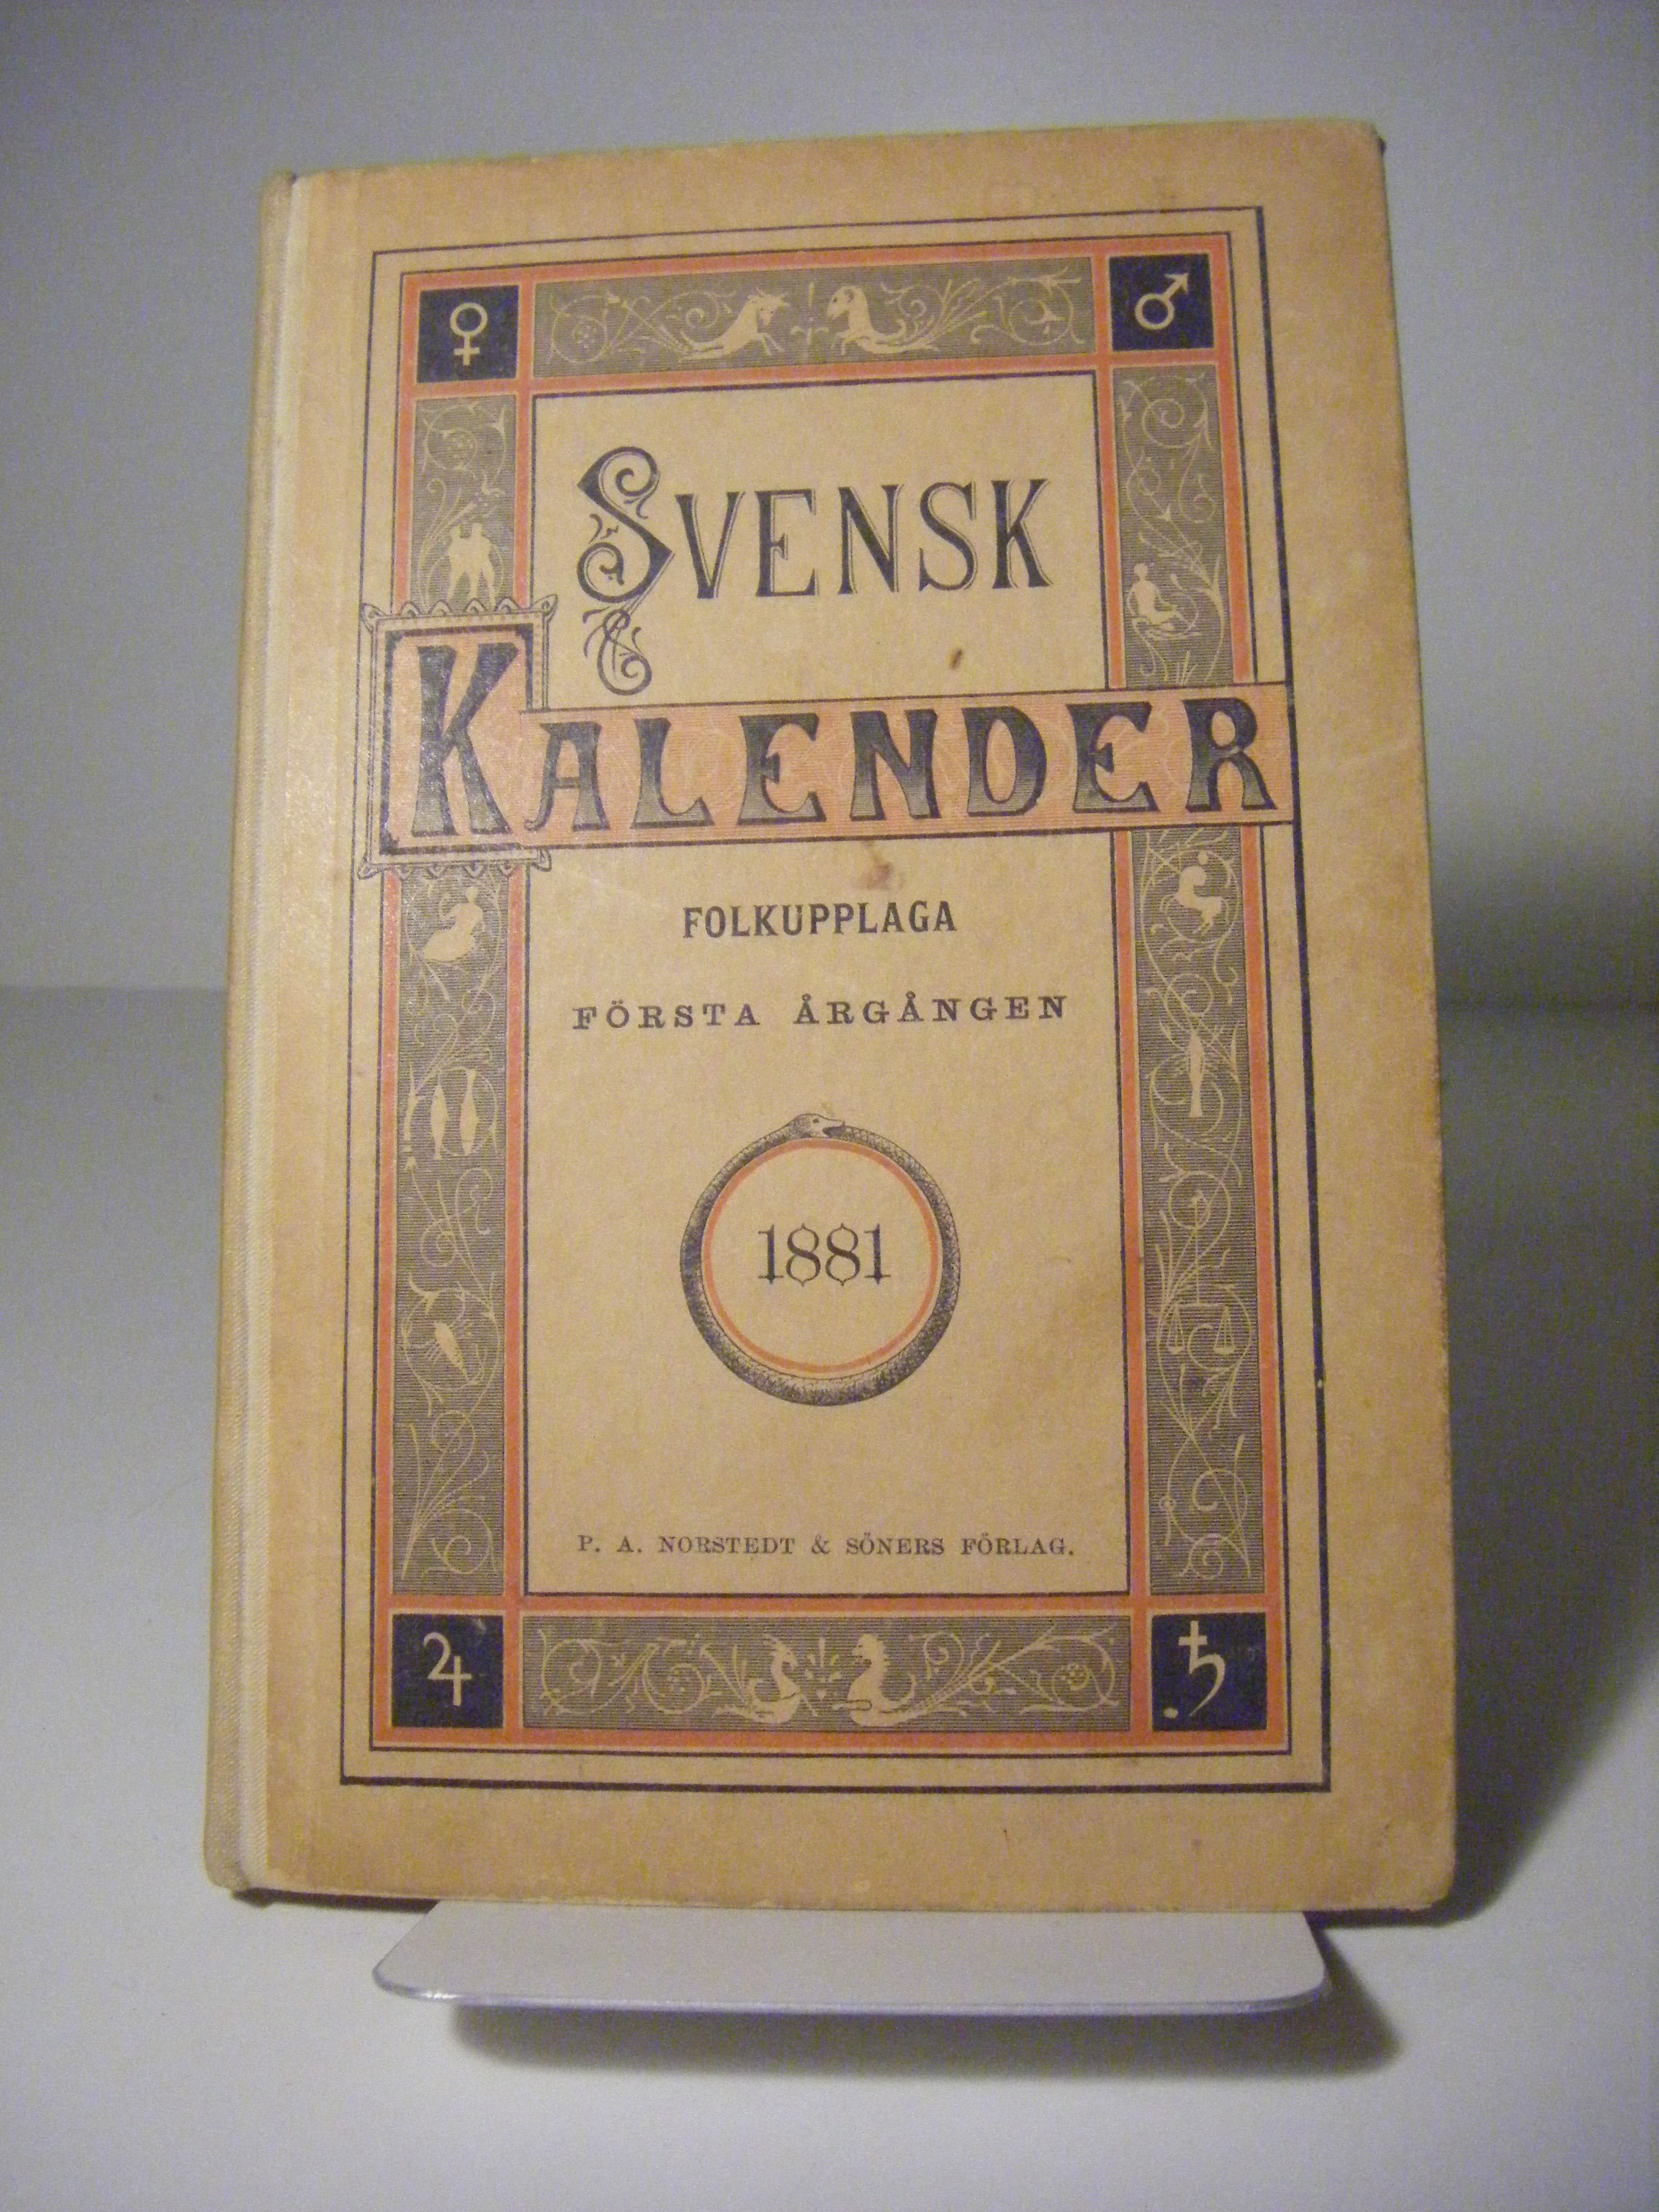 Per ahlmarks bok ger ny svensk utsikt